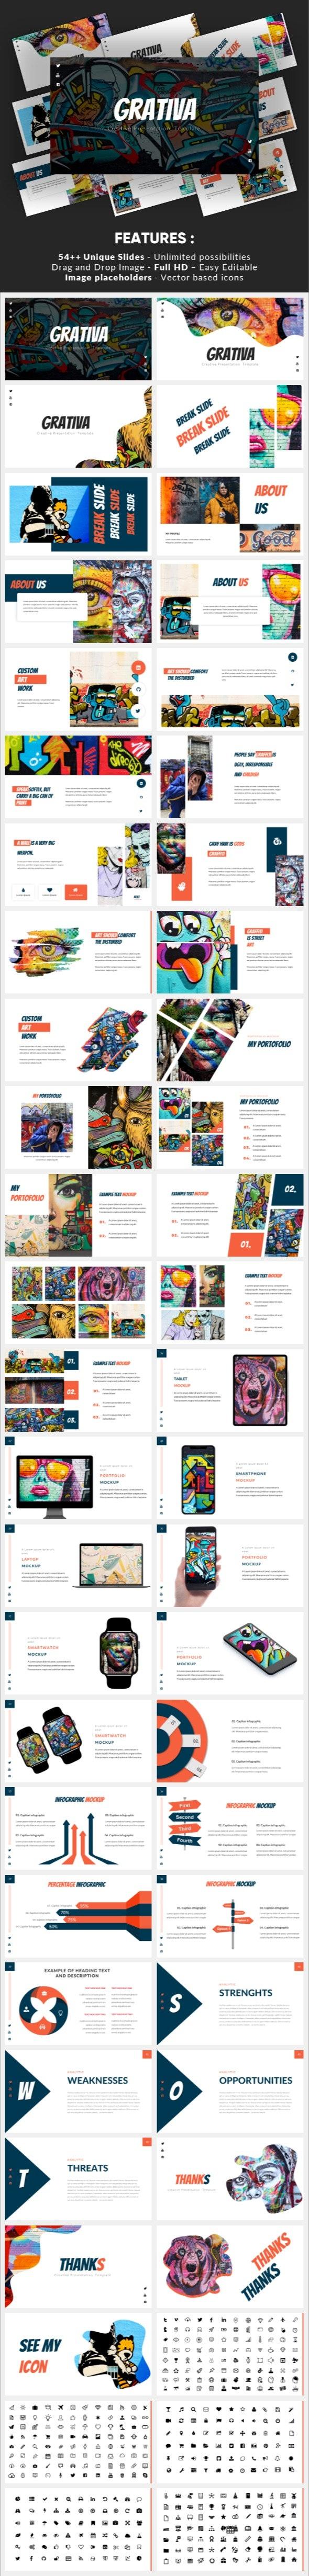 Grativa - Creative Powerpoint Template - Creative PowerPoint Templates